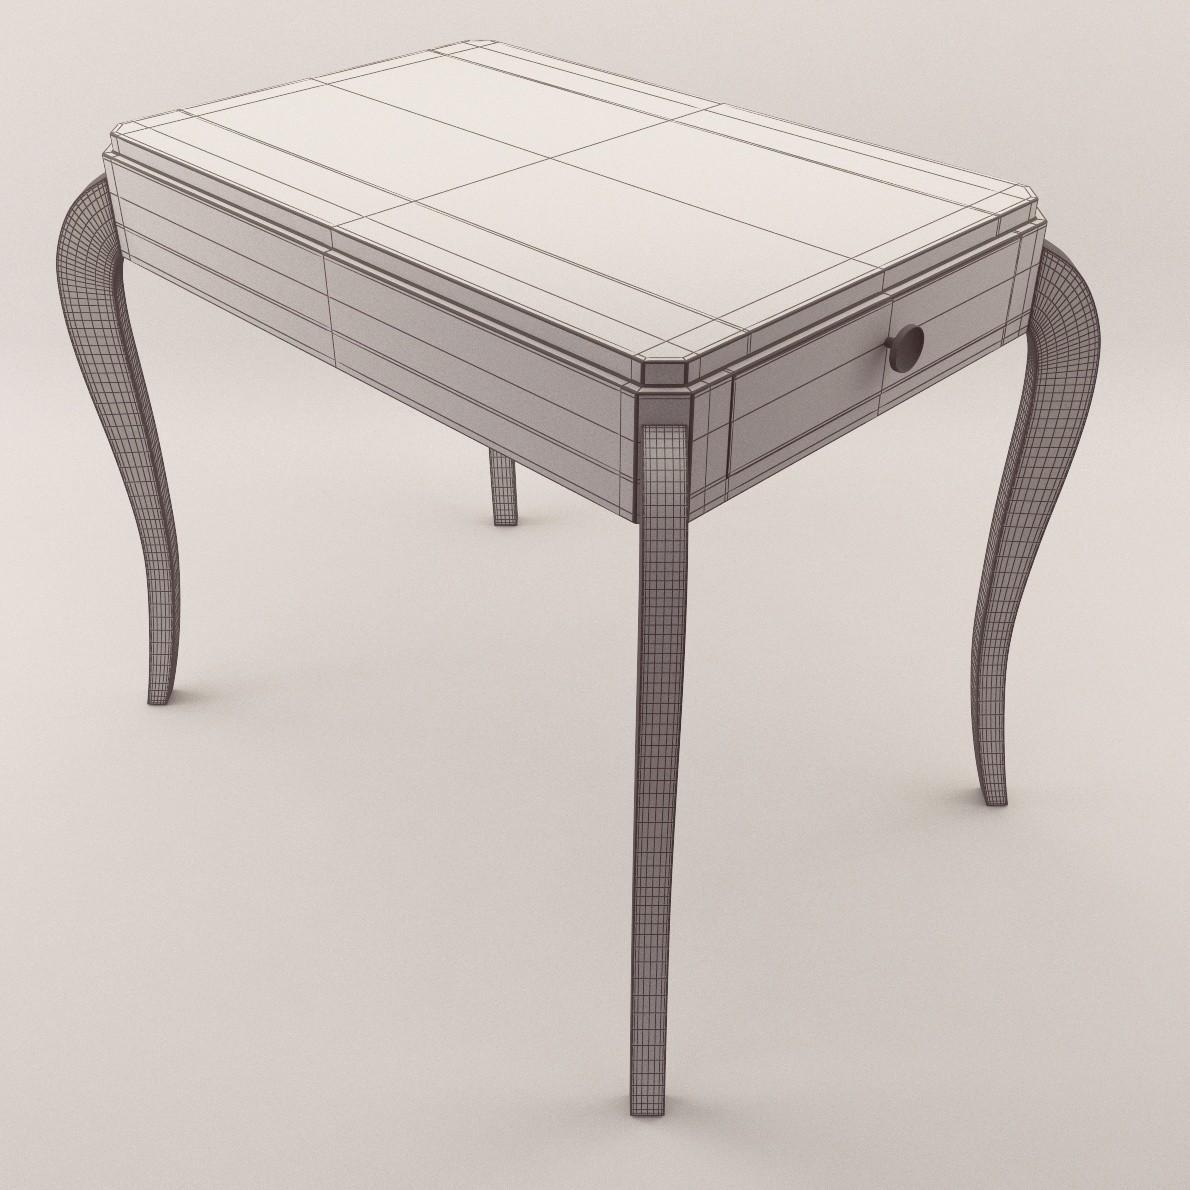 art deco salon table 3d realistic model artium3d. Black Bedroom Furniture Sets. Home Design Ideas